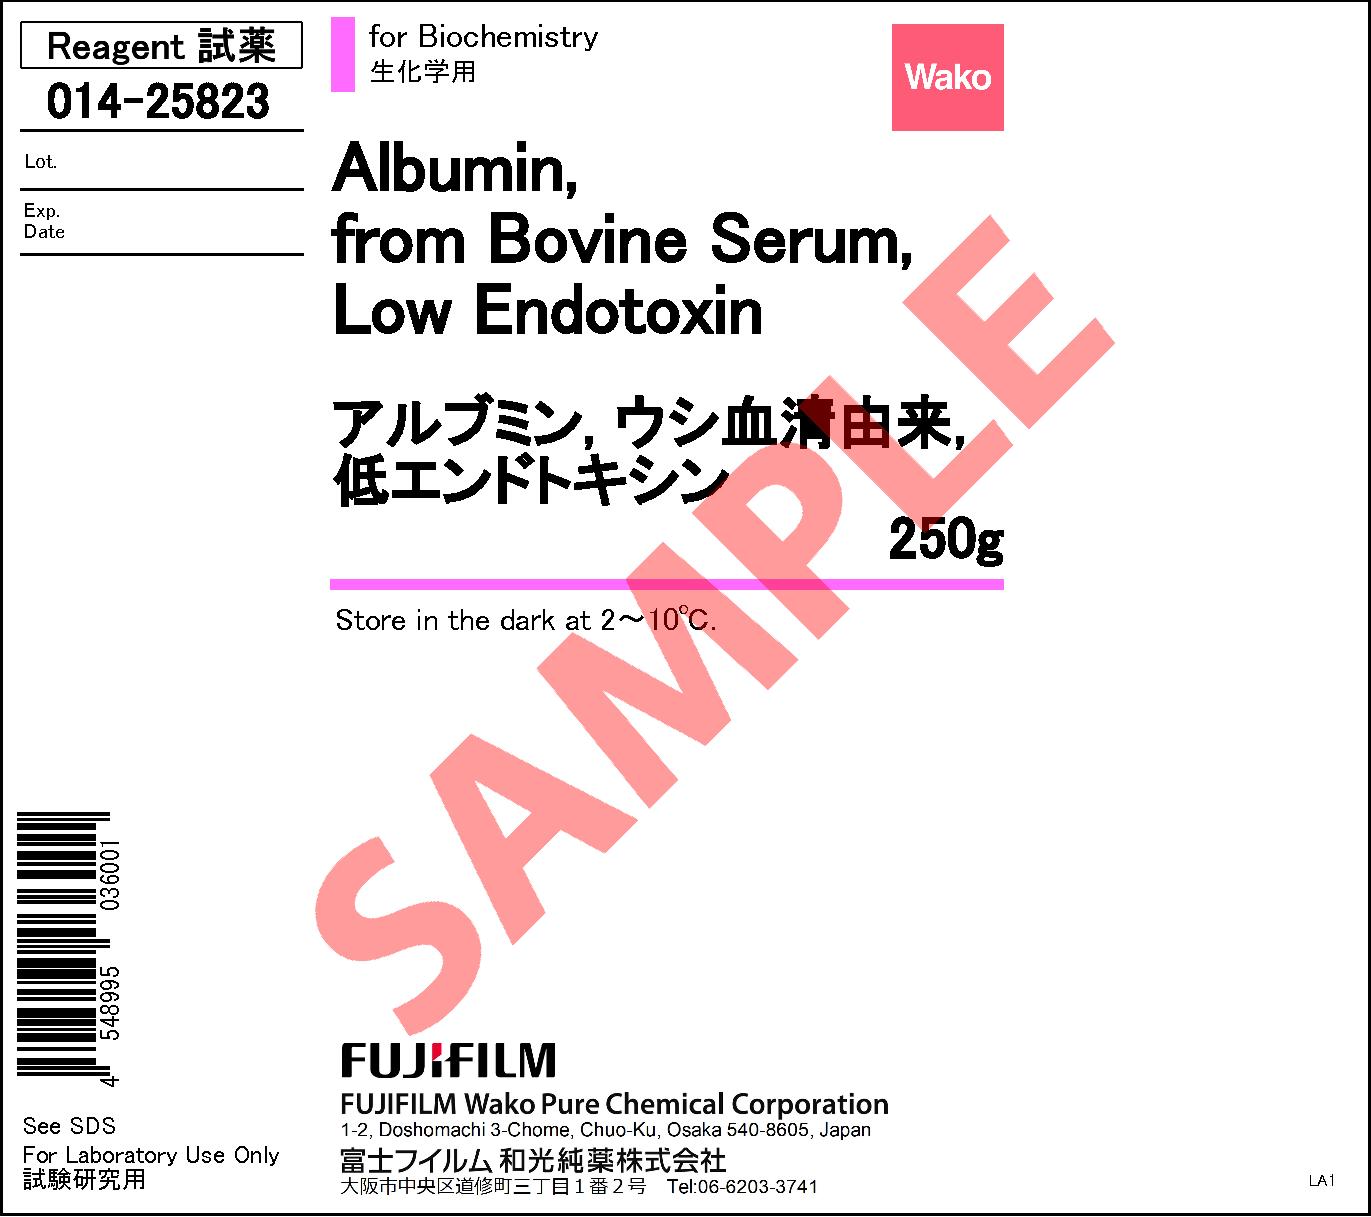 9048-46-8・Albumin, from Bovine Serum (BSA), Low Endotoxin